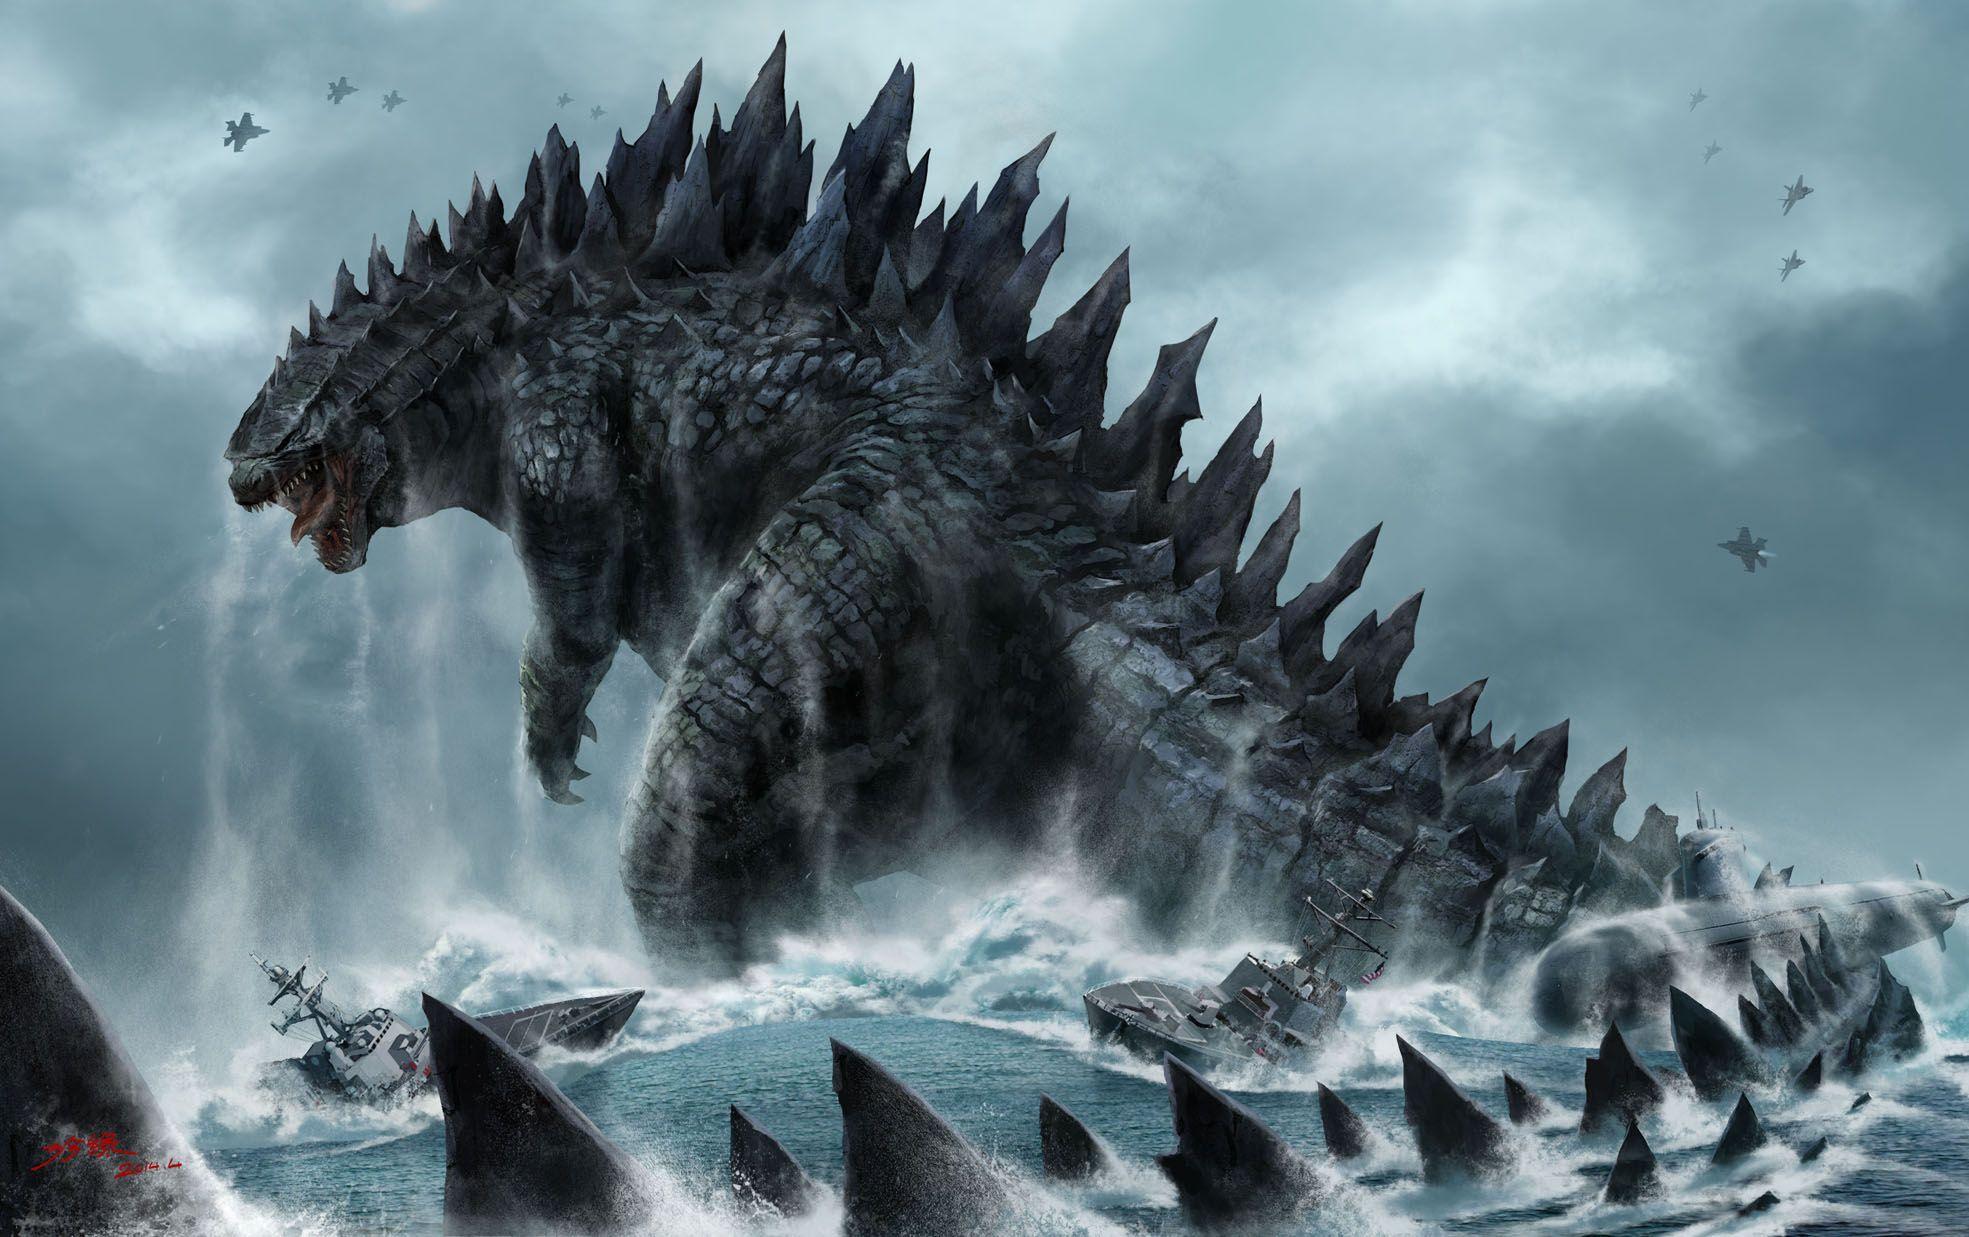 Imgur Godzilla Wallpaper Godzilla 2014 Movie Godzilla 2014